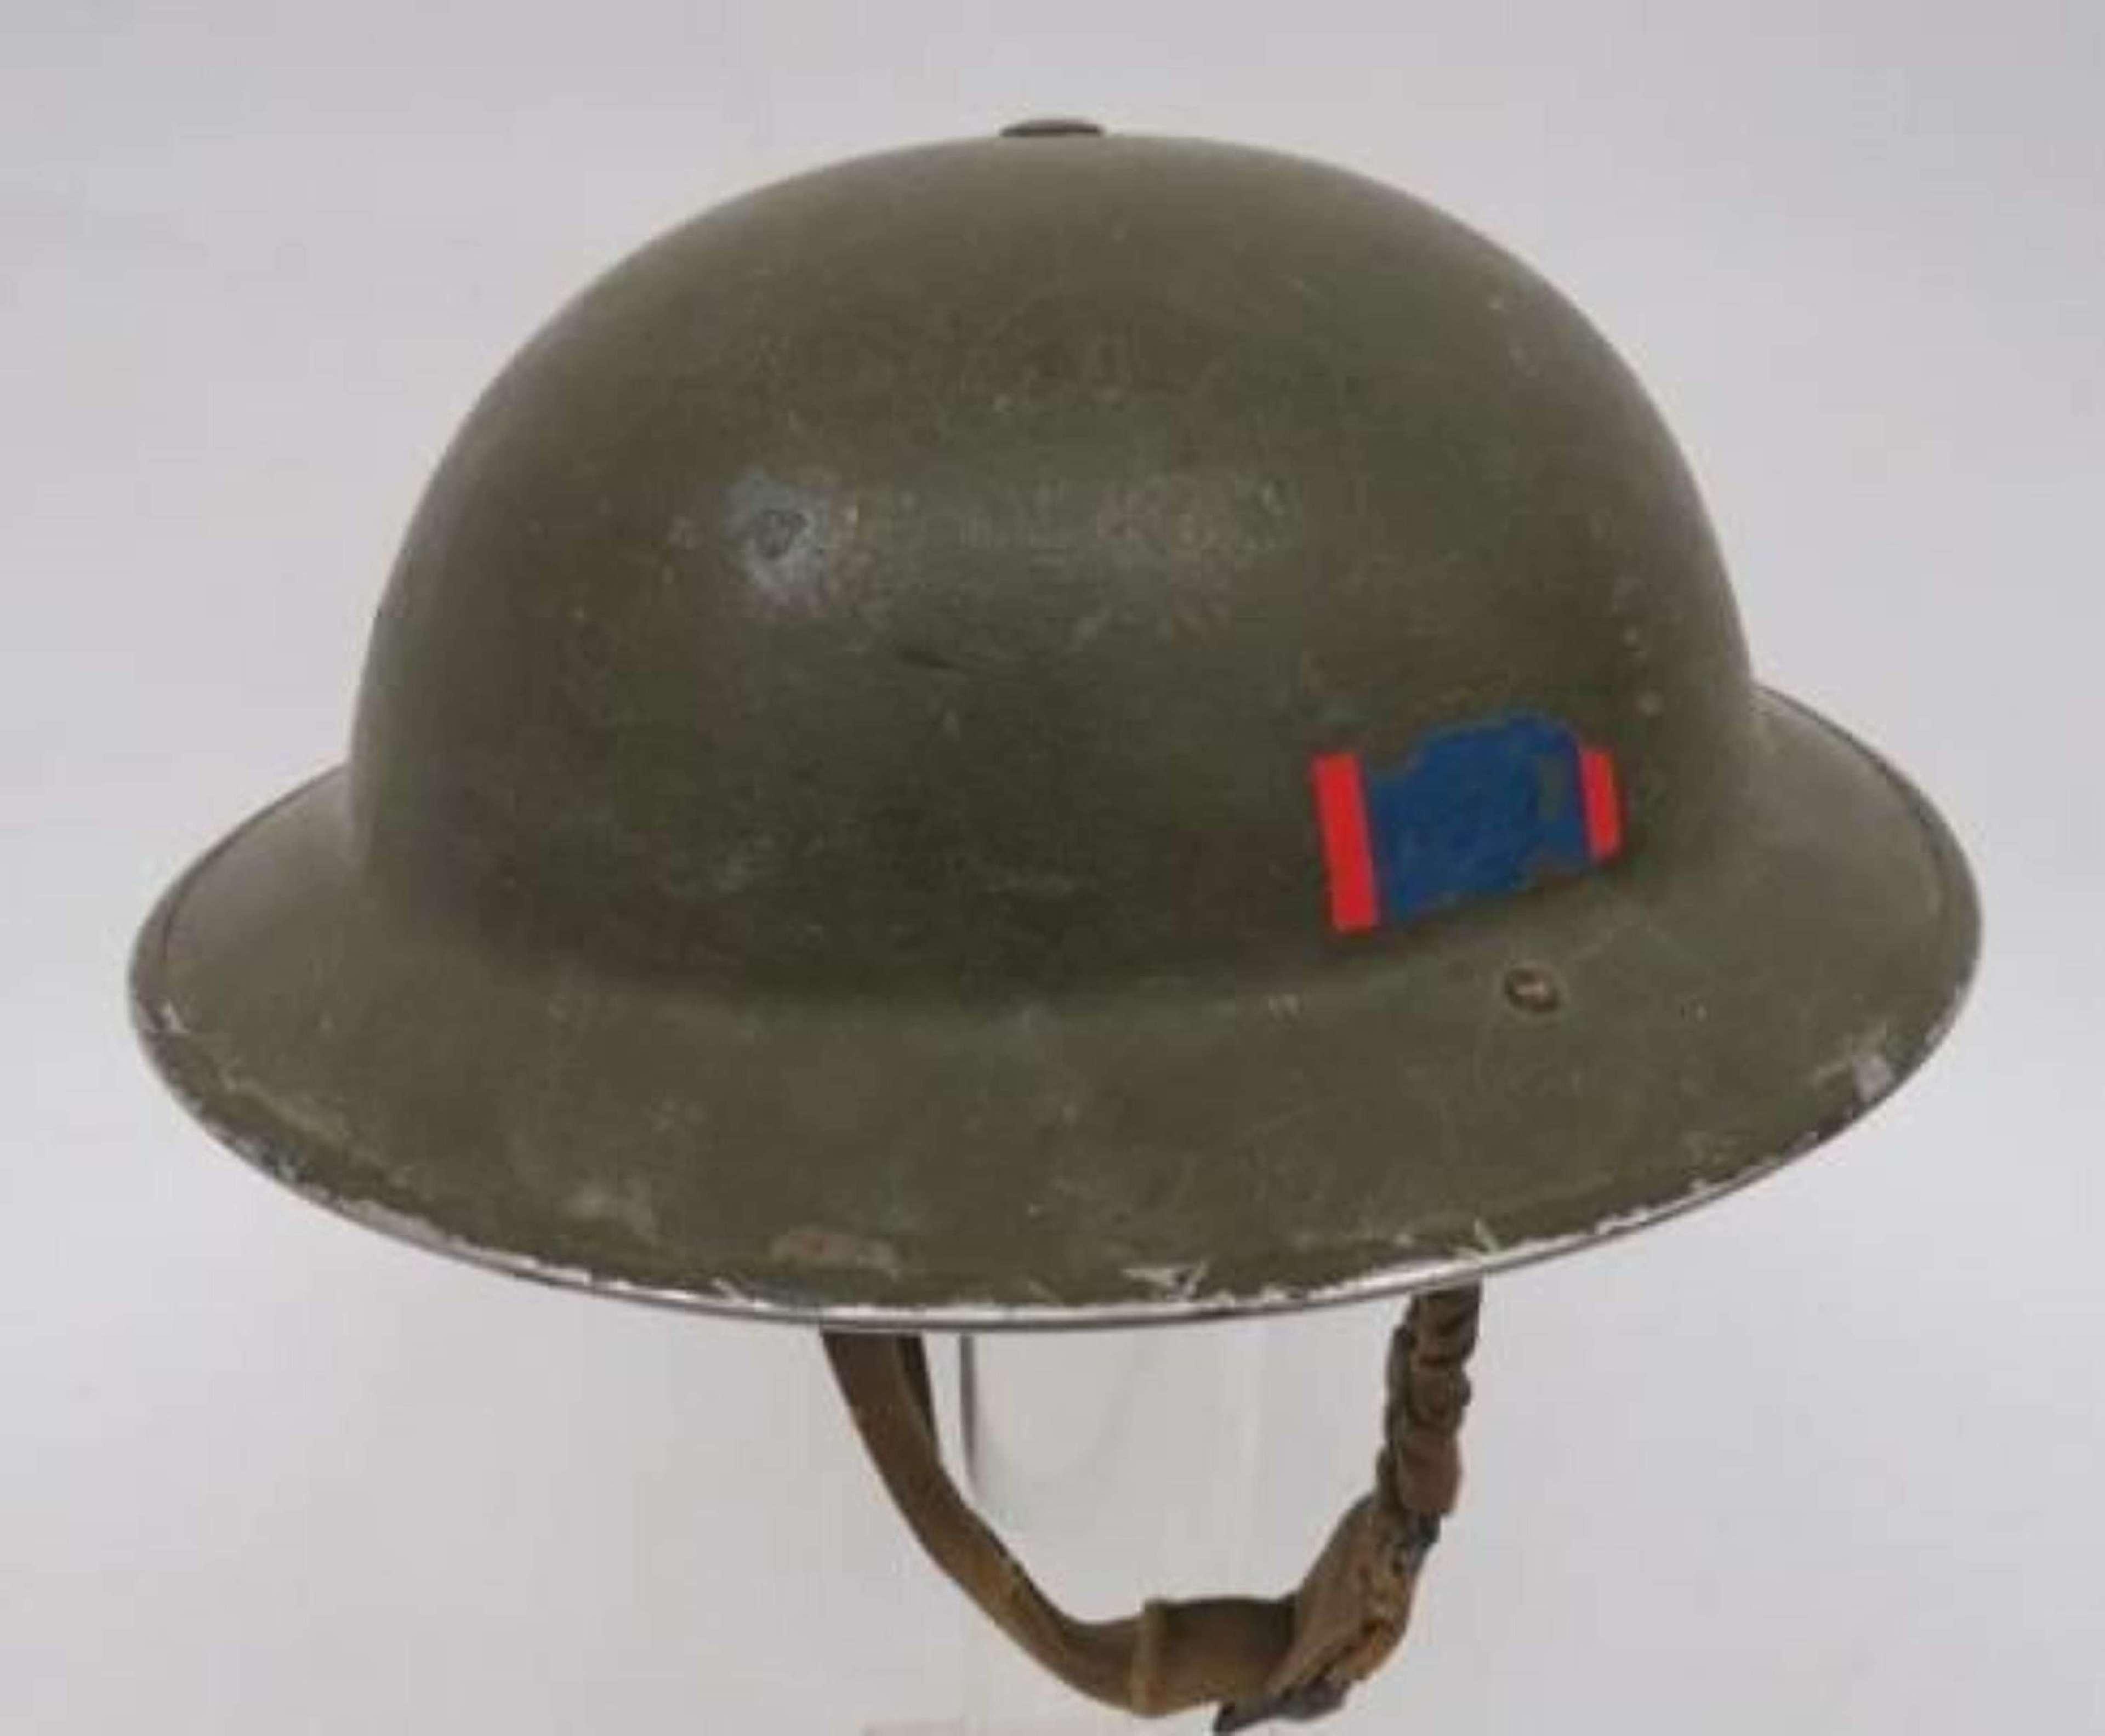 1940 Dated Regimentally Flashed Steel Helmet